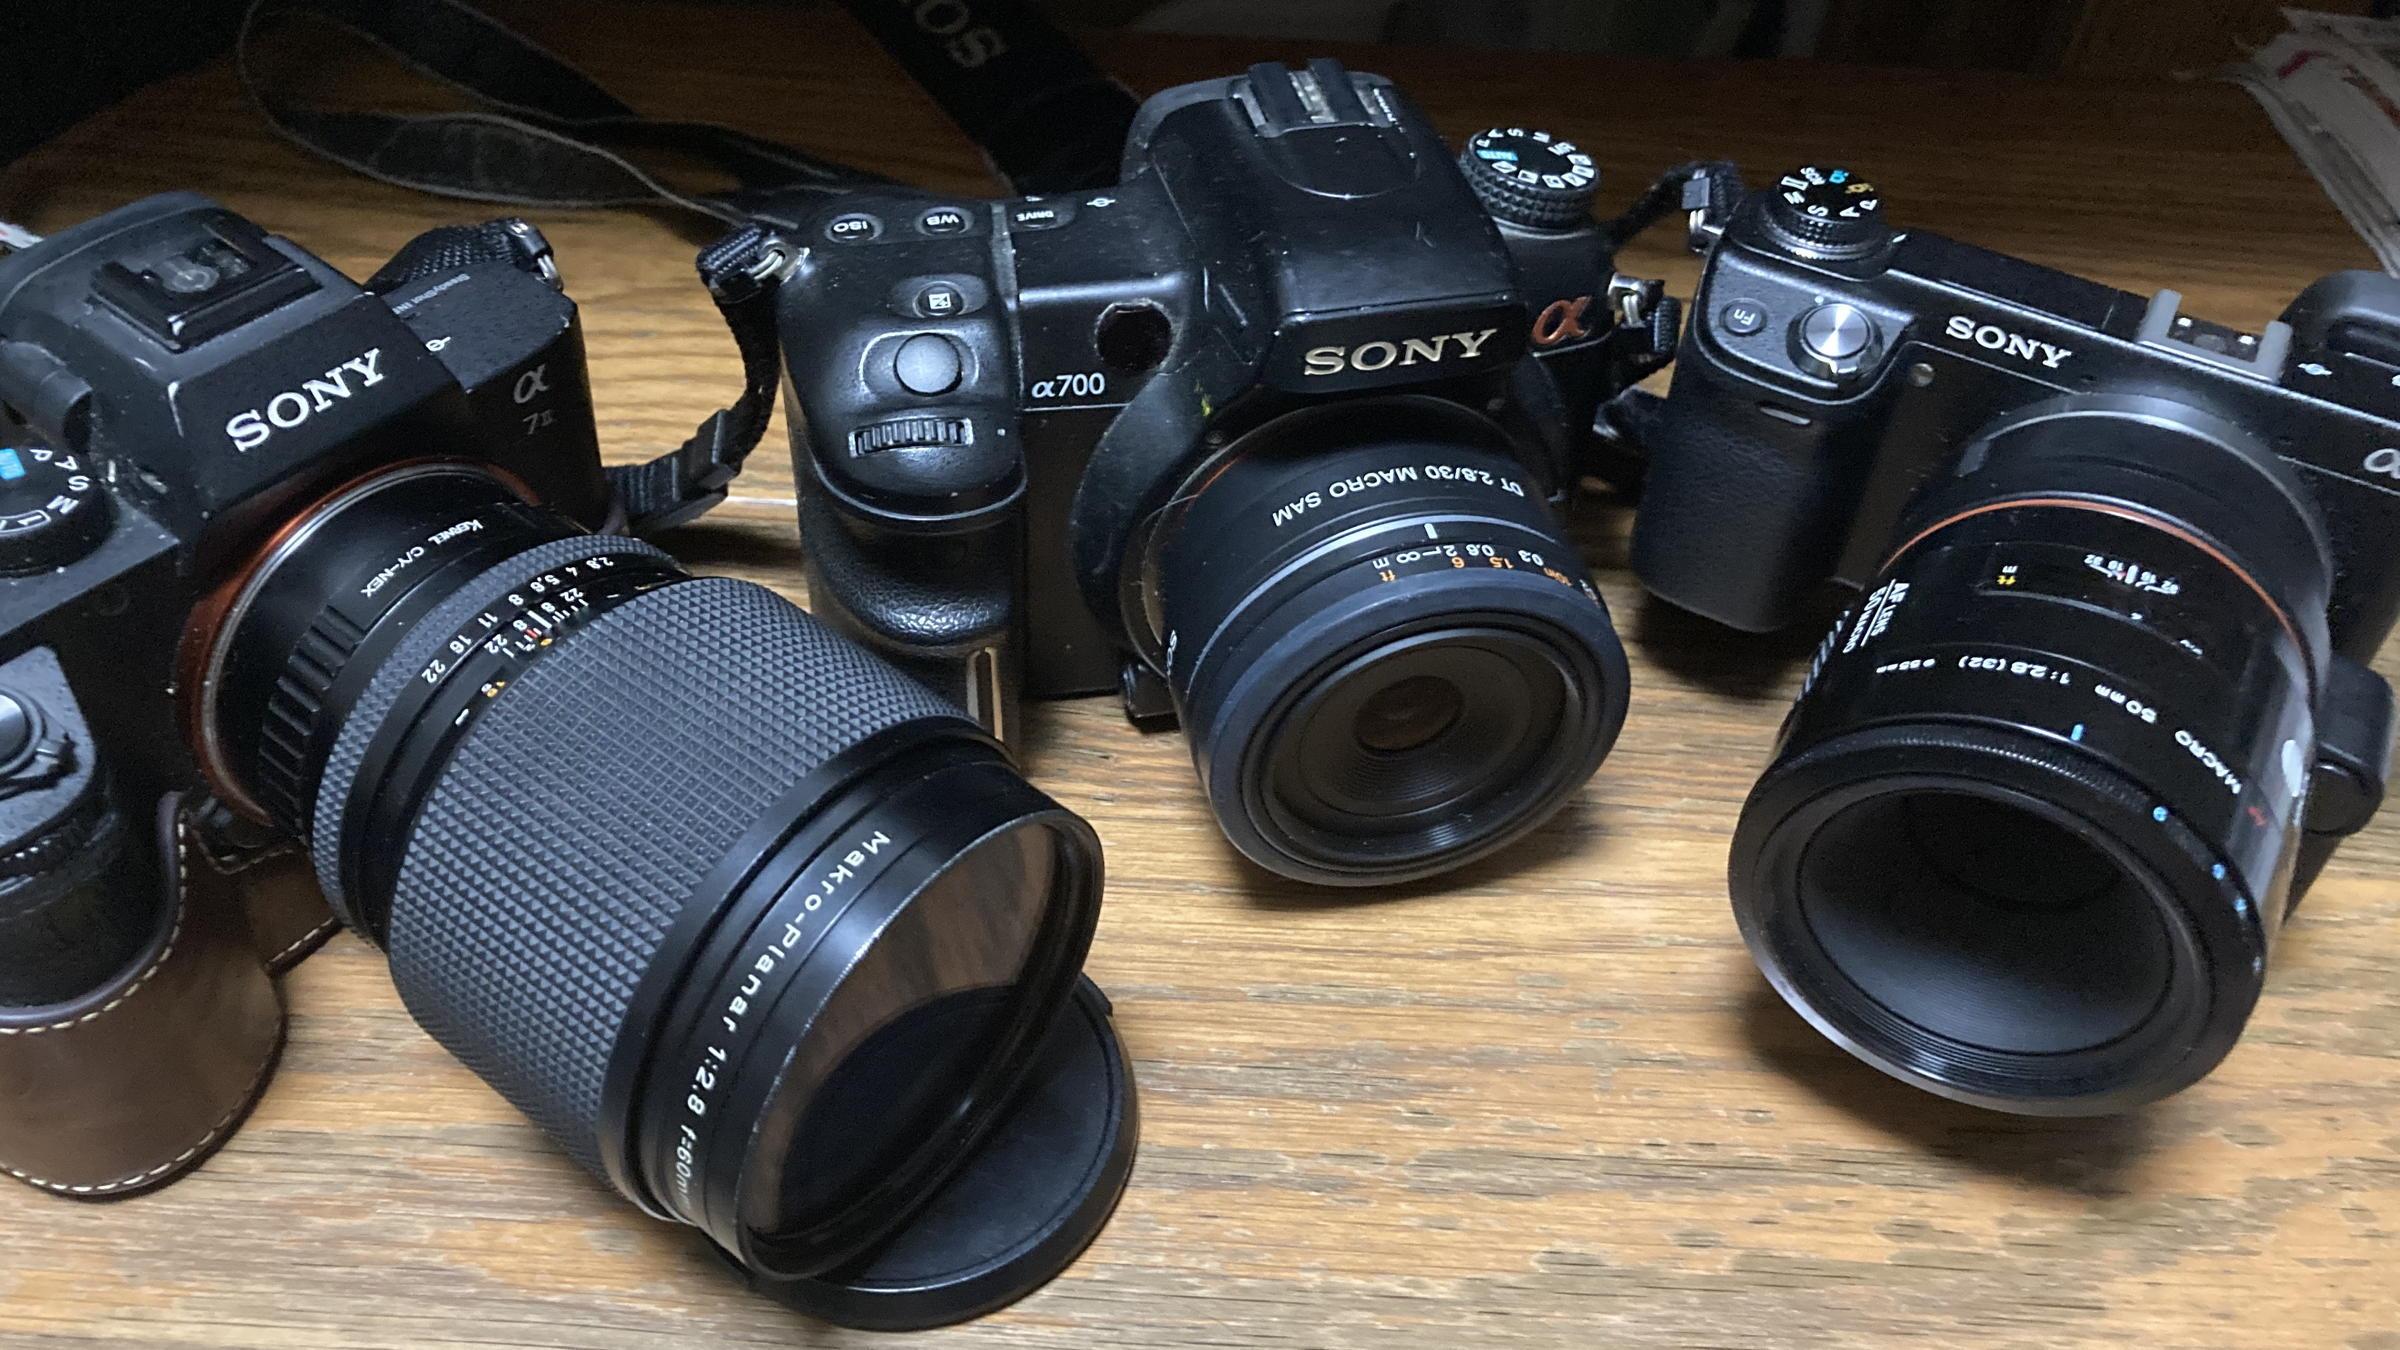 SONY DT 30mm F2.8 Macro_b0060239_22254747.jpg